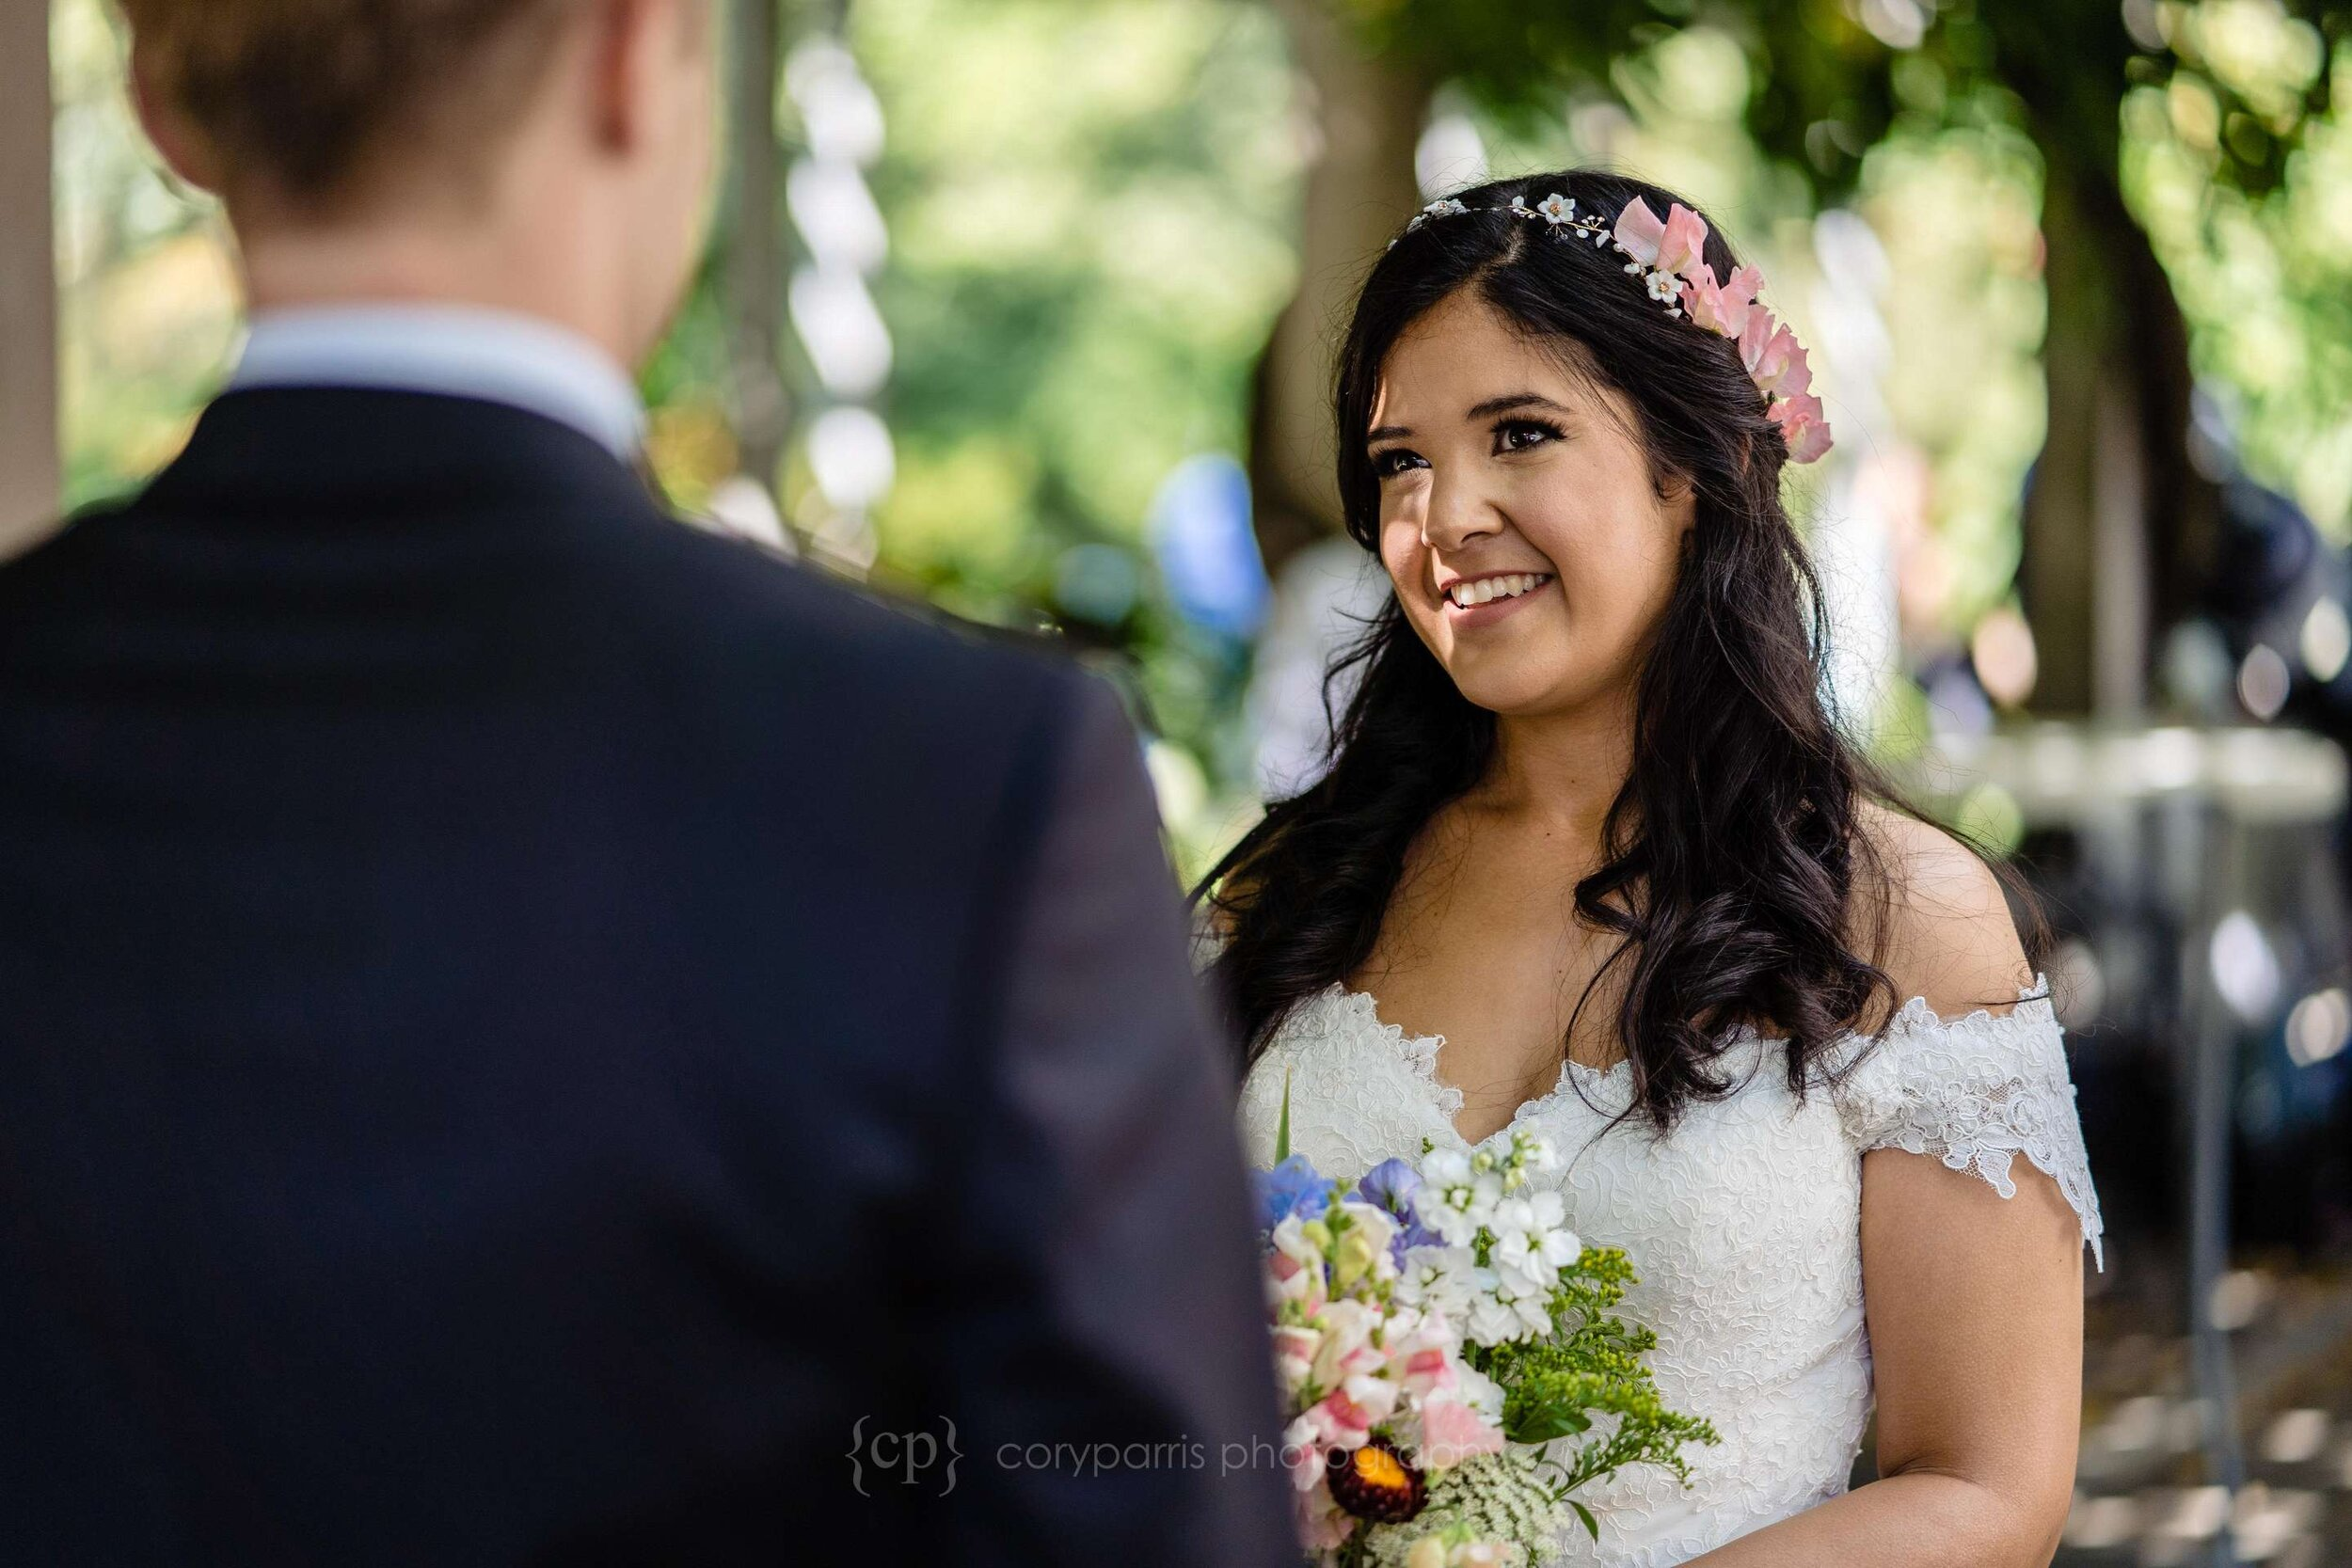 019-washington-park-arboretum-wedding.jpg